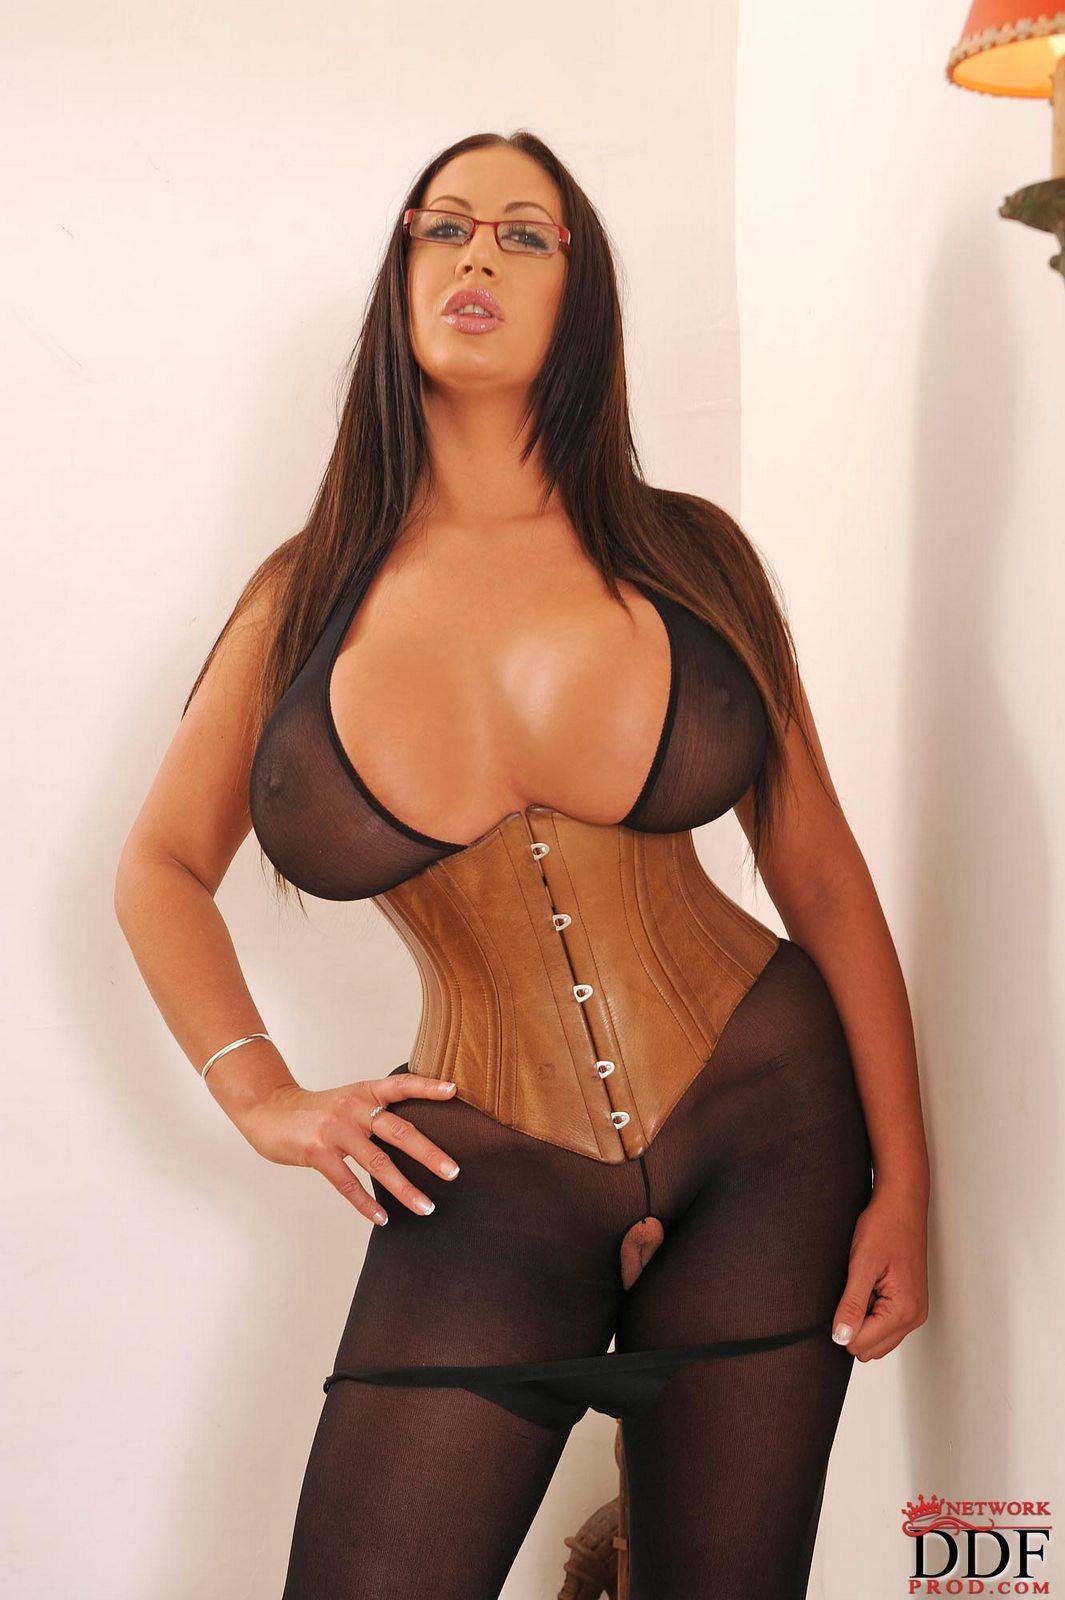 Big ass in corset